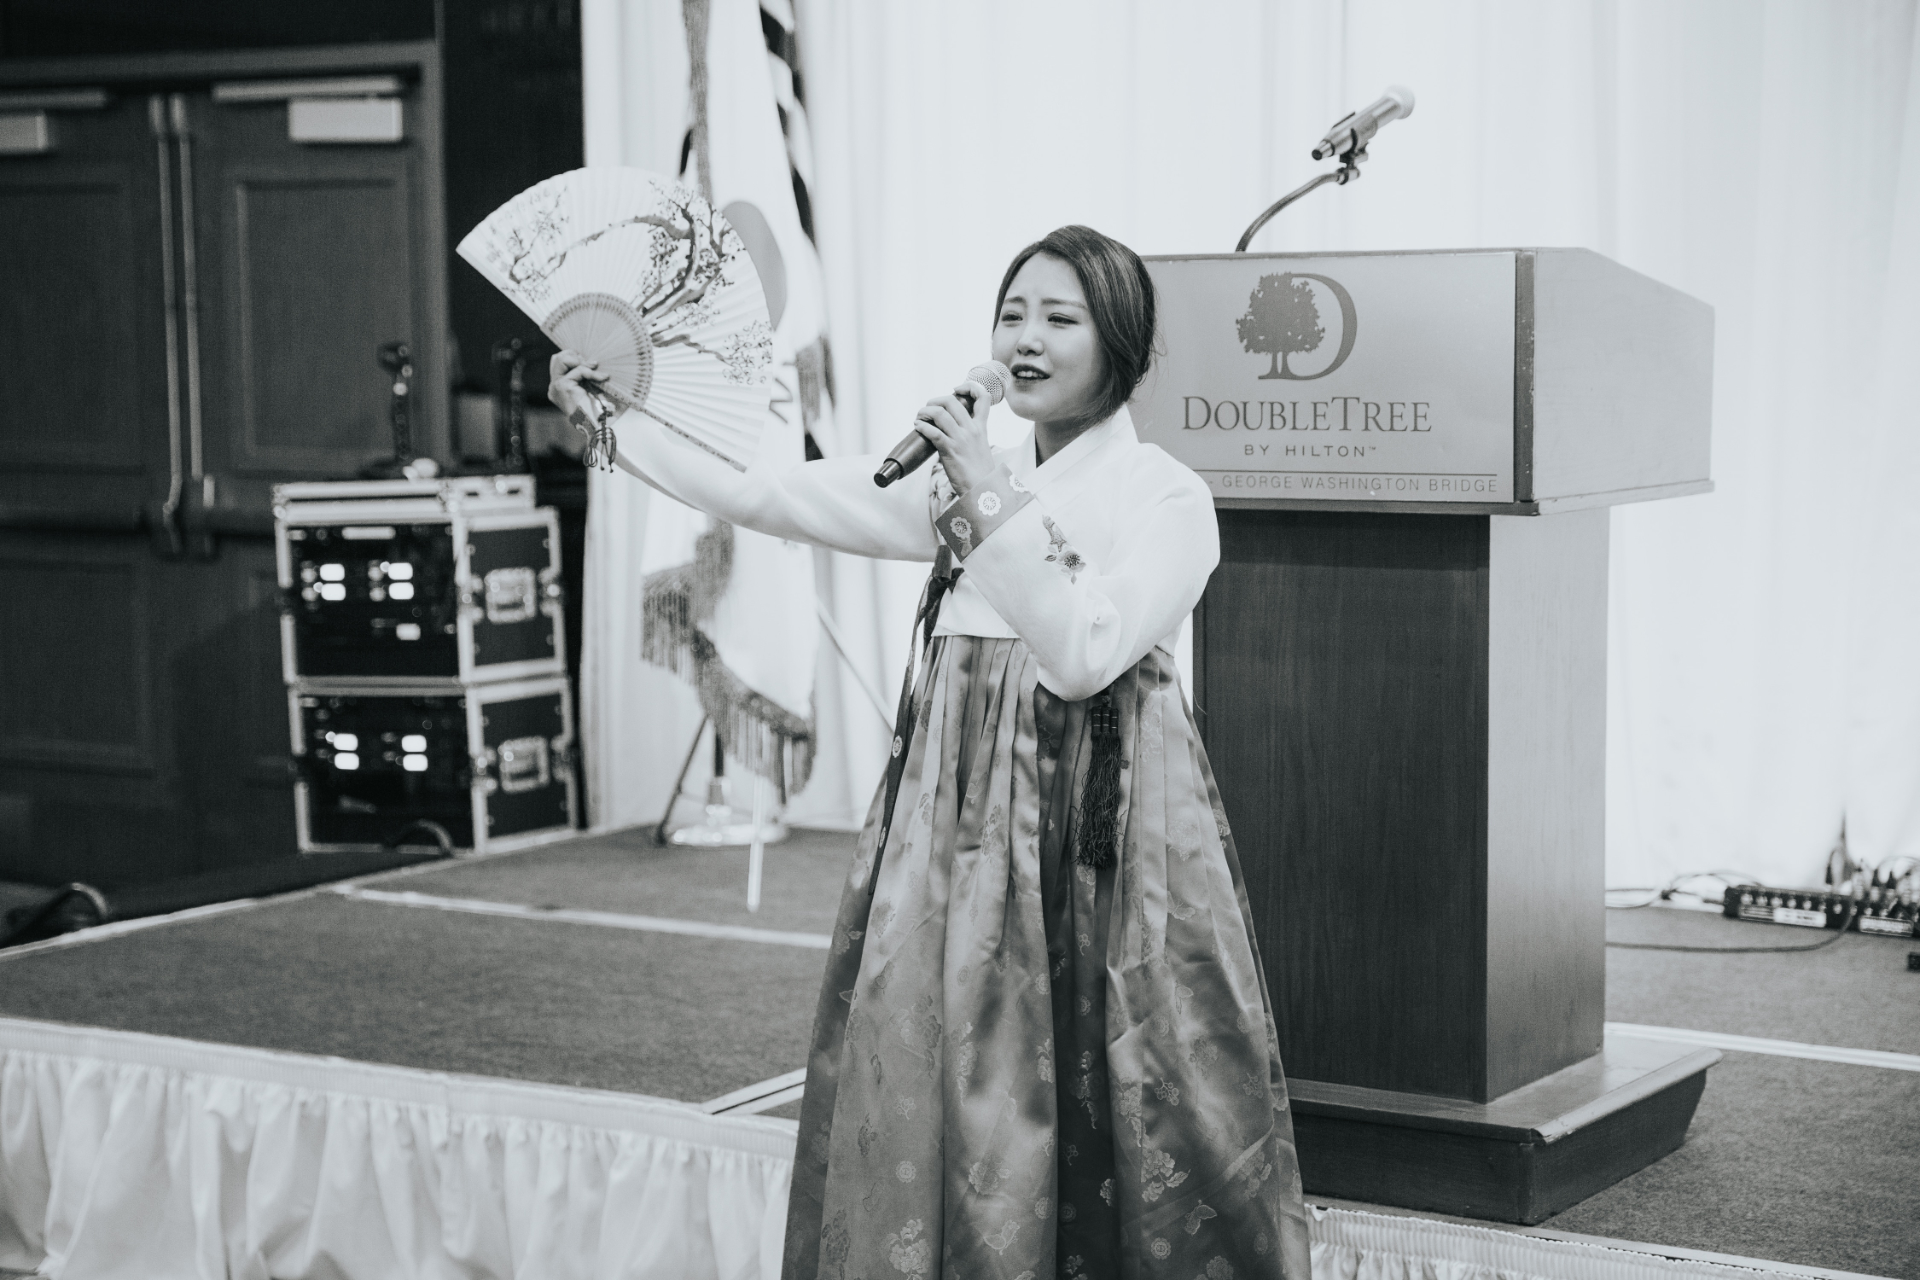 https://nykbi.com/new/wp-content/uploads/2019/07/190607-NYKBI-Inauguration-Ceremony-331.jpg